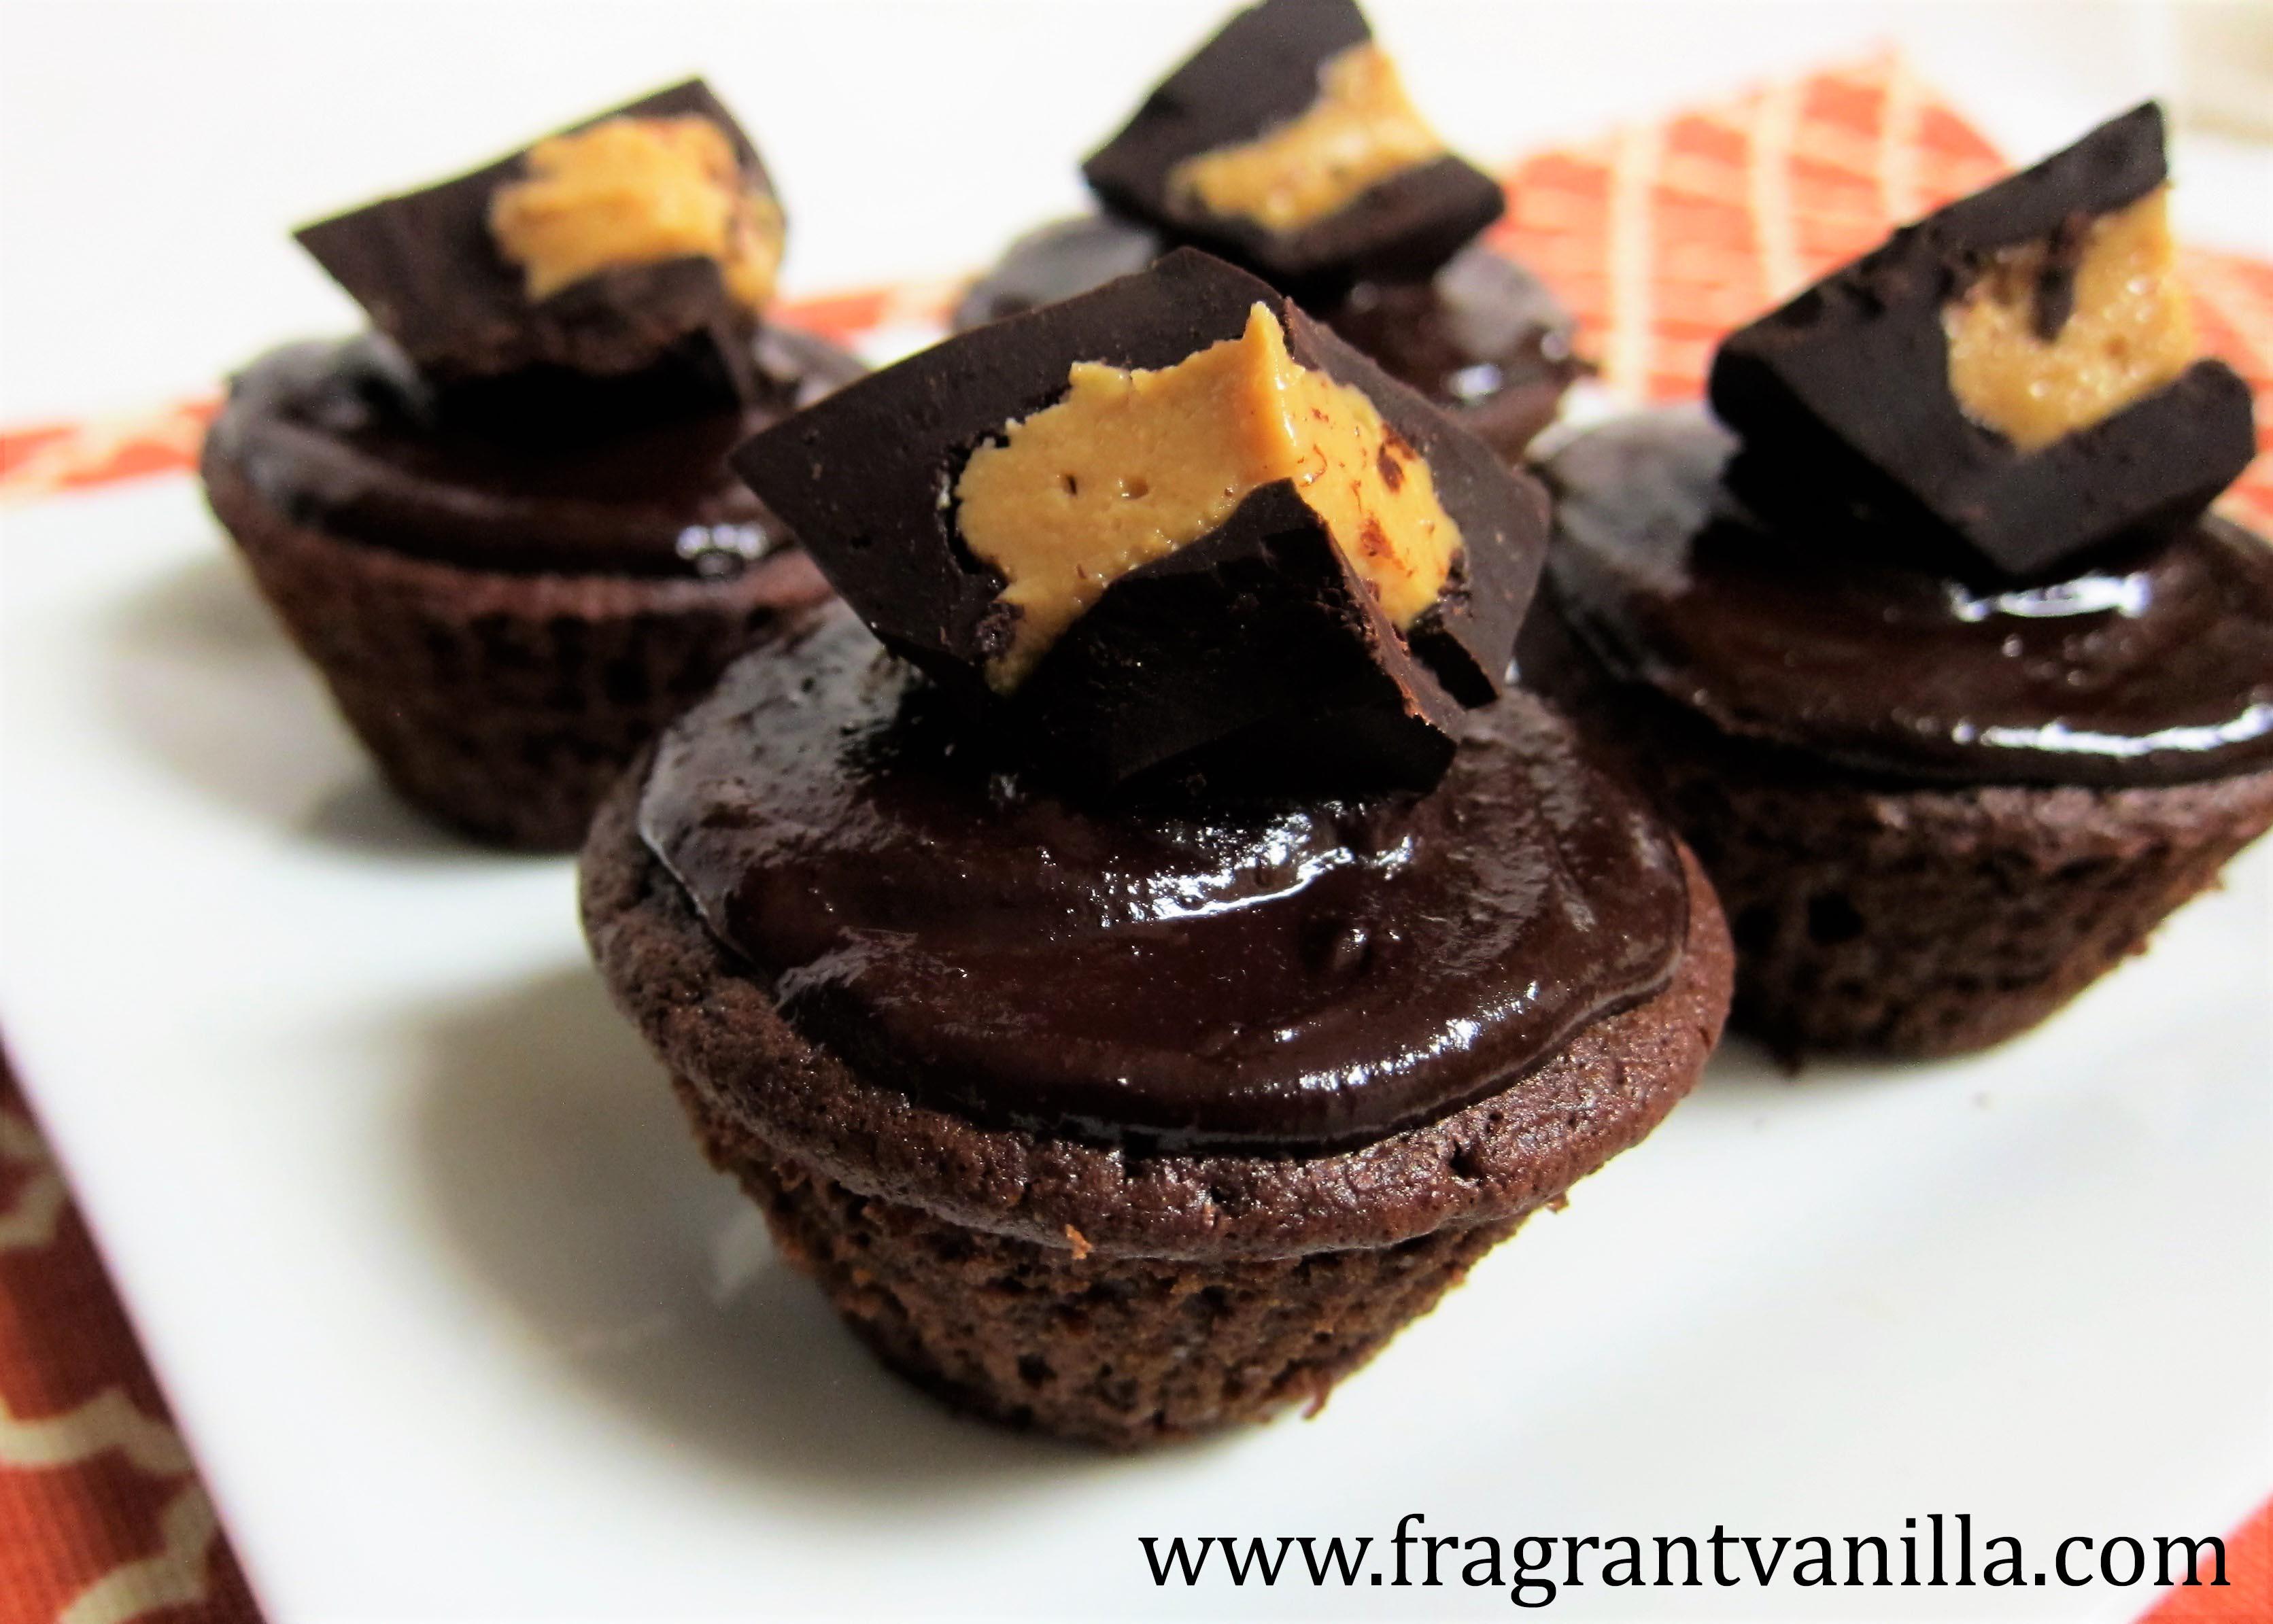 Vegan Peanut Butter Cup Cupcakes